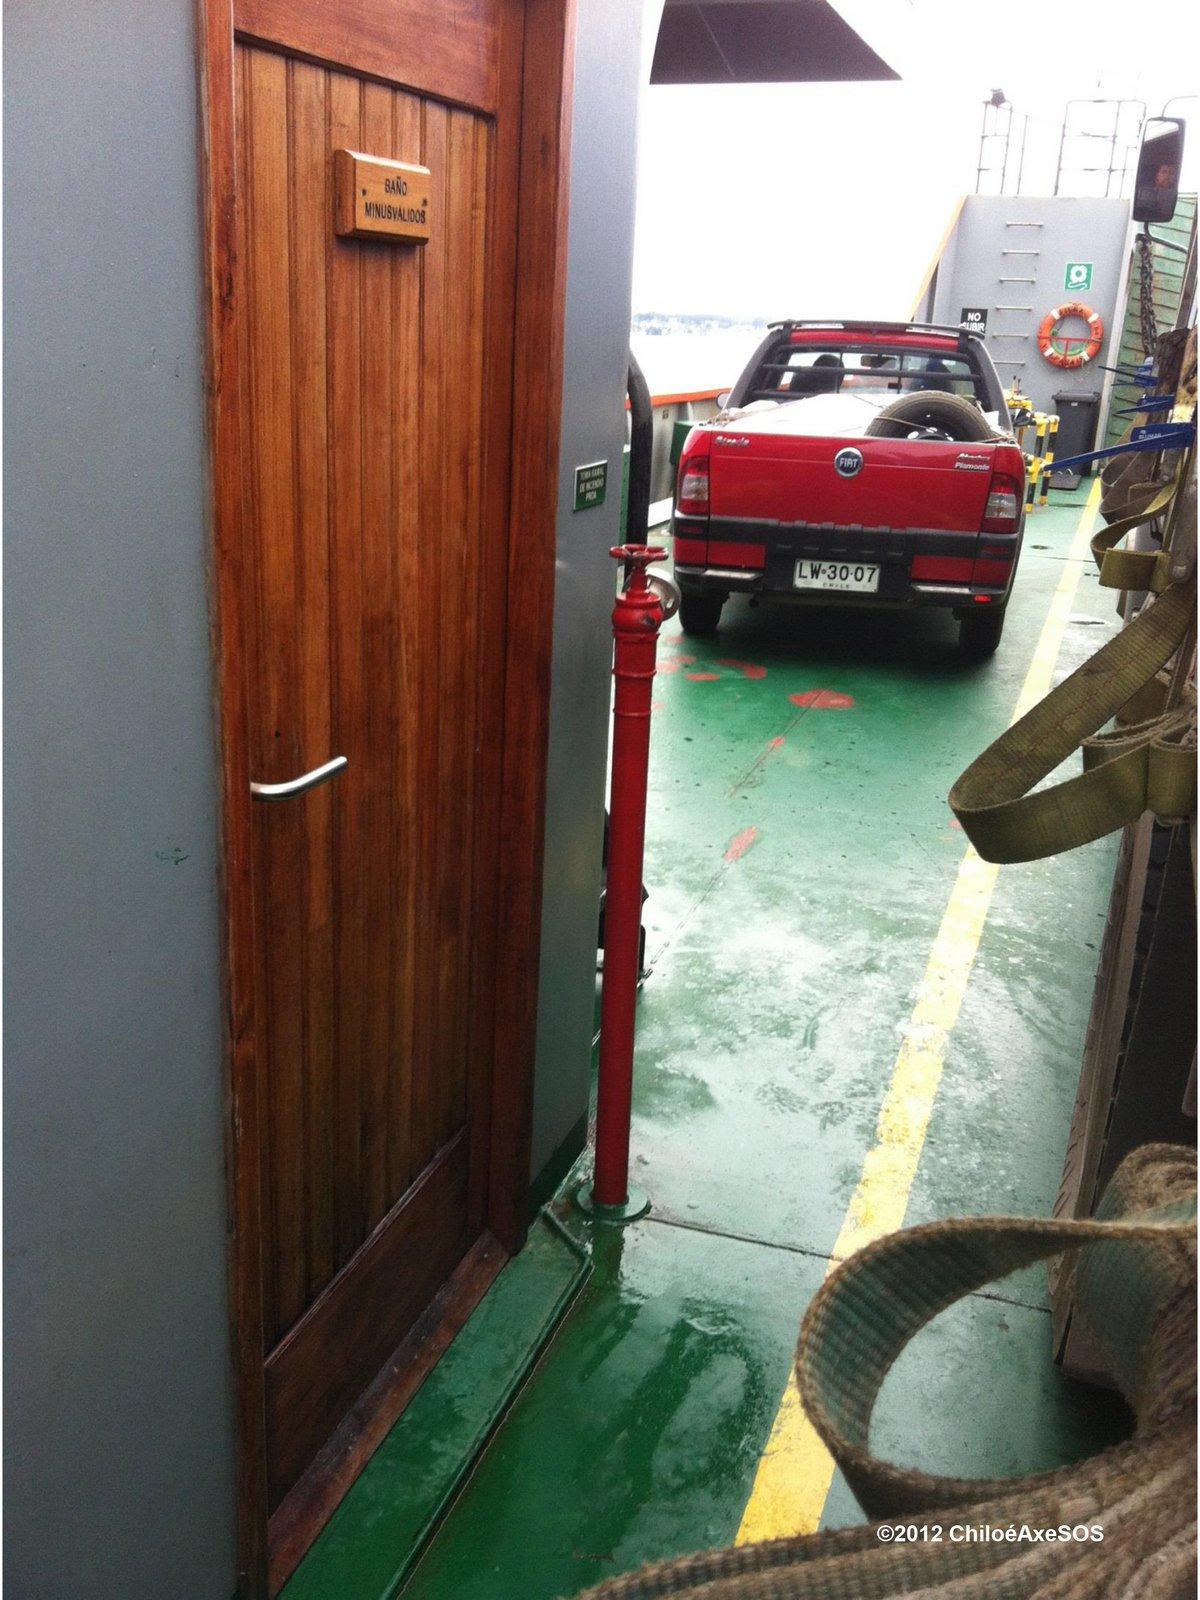 2012 Baño accesible de difícil acceso